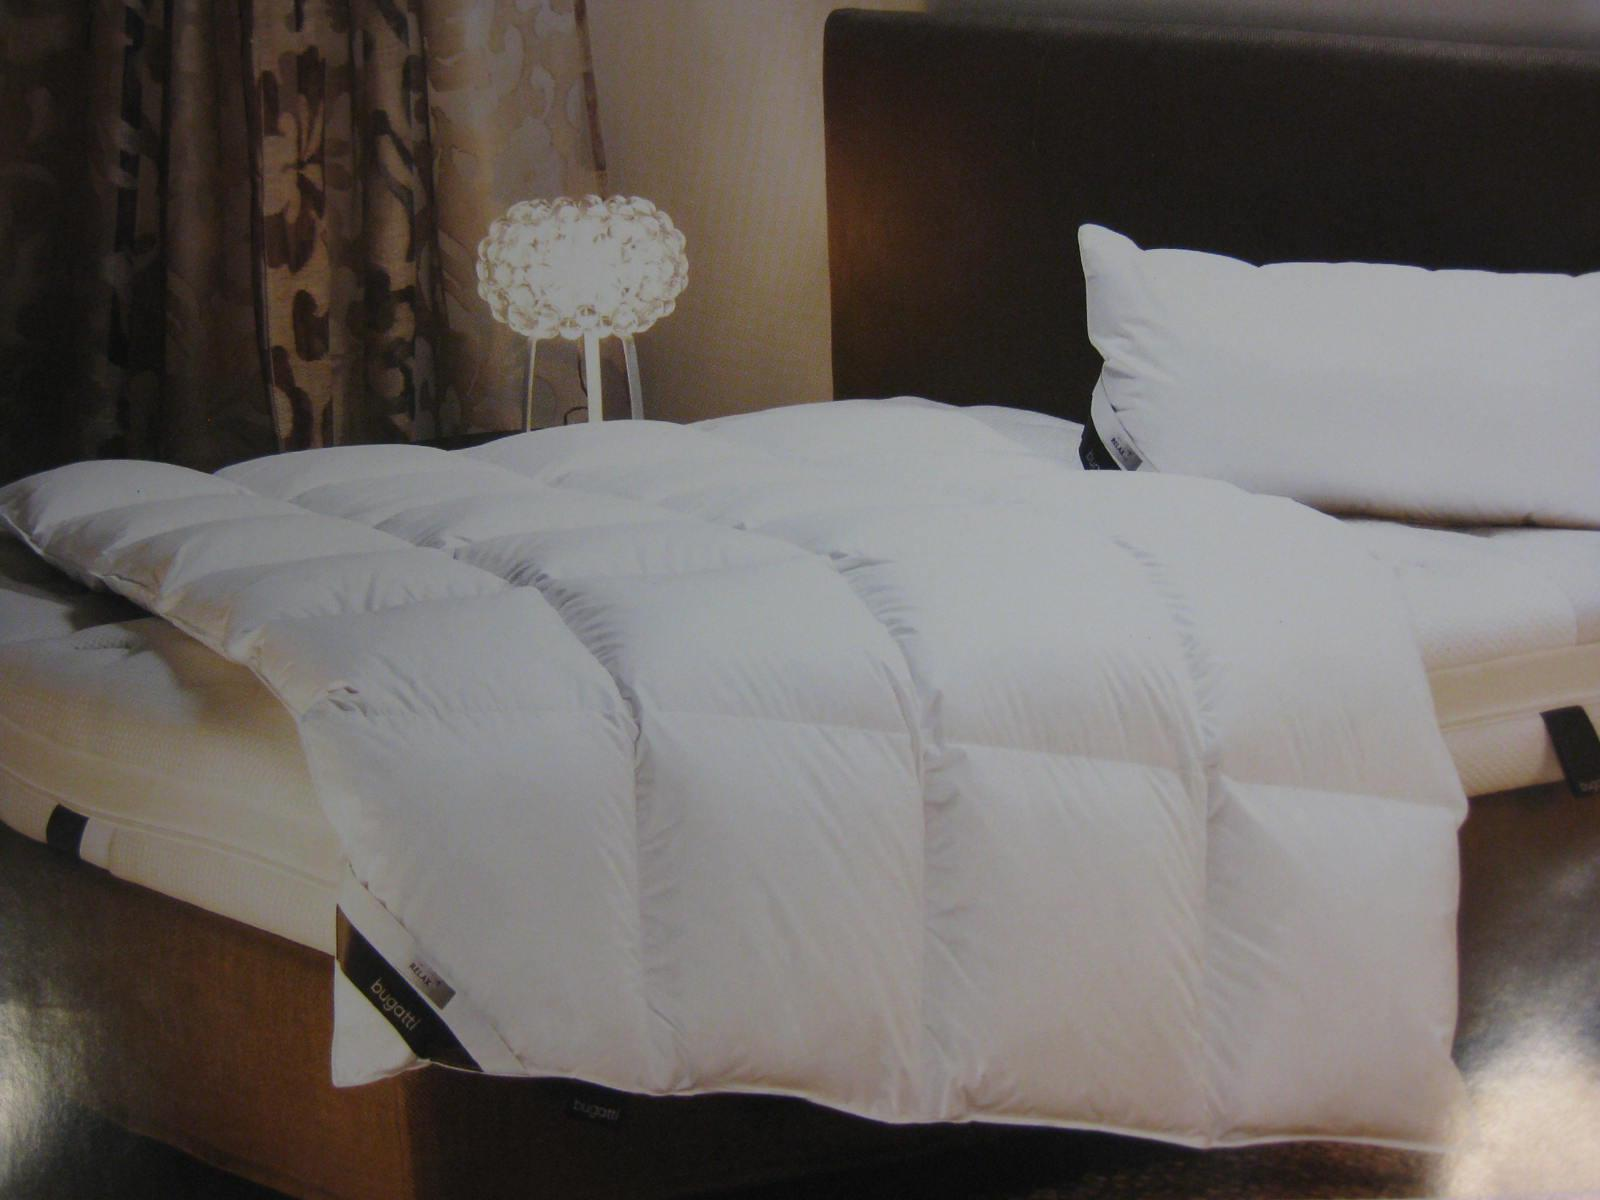 daunendecke xl warm von bugatti 135x200 cm bettdecke 800 g 100 g nse daunen bettdecke lager. Black Bedroom Furniture Sets. Home Design Ideas